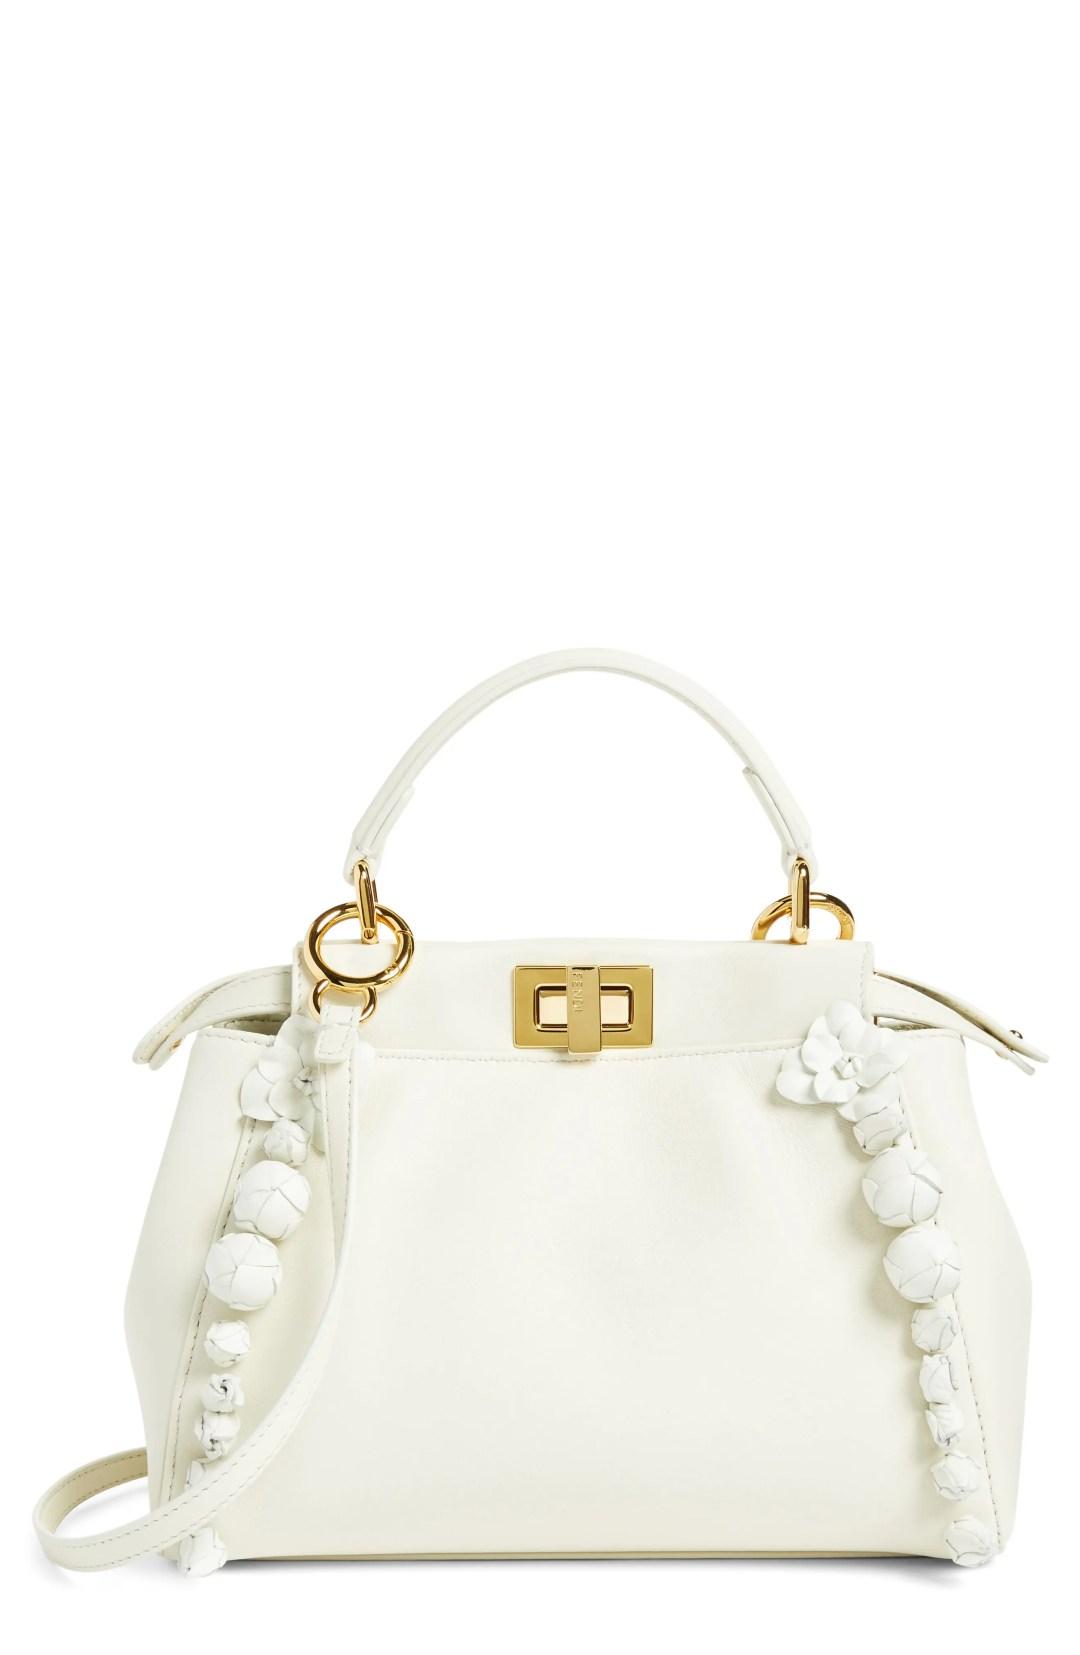 4caa3d693 Fendi Mini Peekaboo Floral Leather Satchel – – NORDSTROM.com – $4,250.00 ...